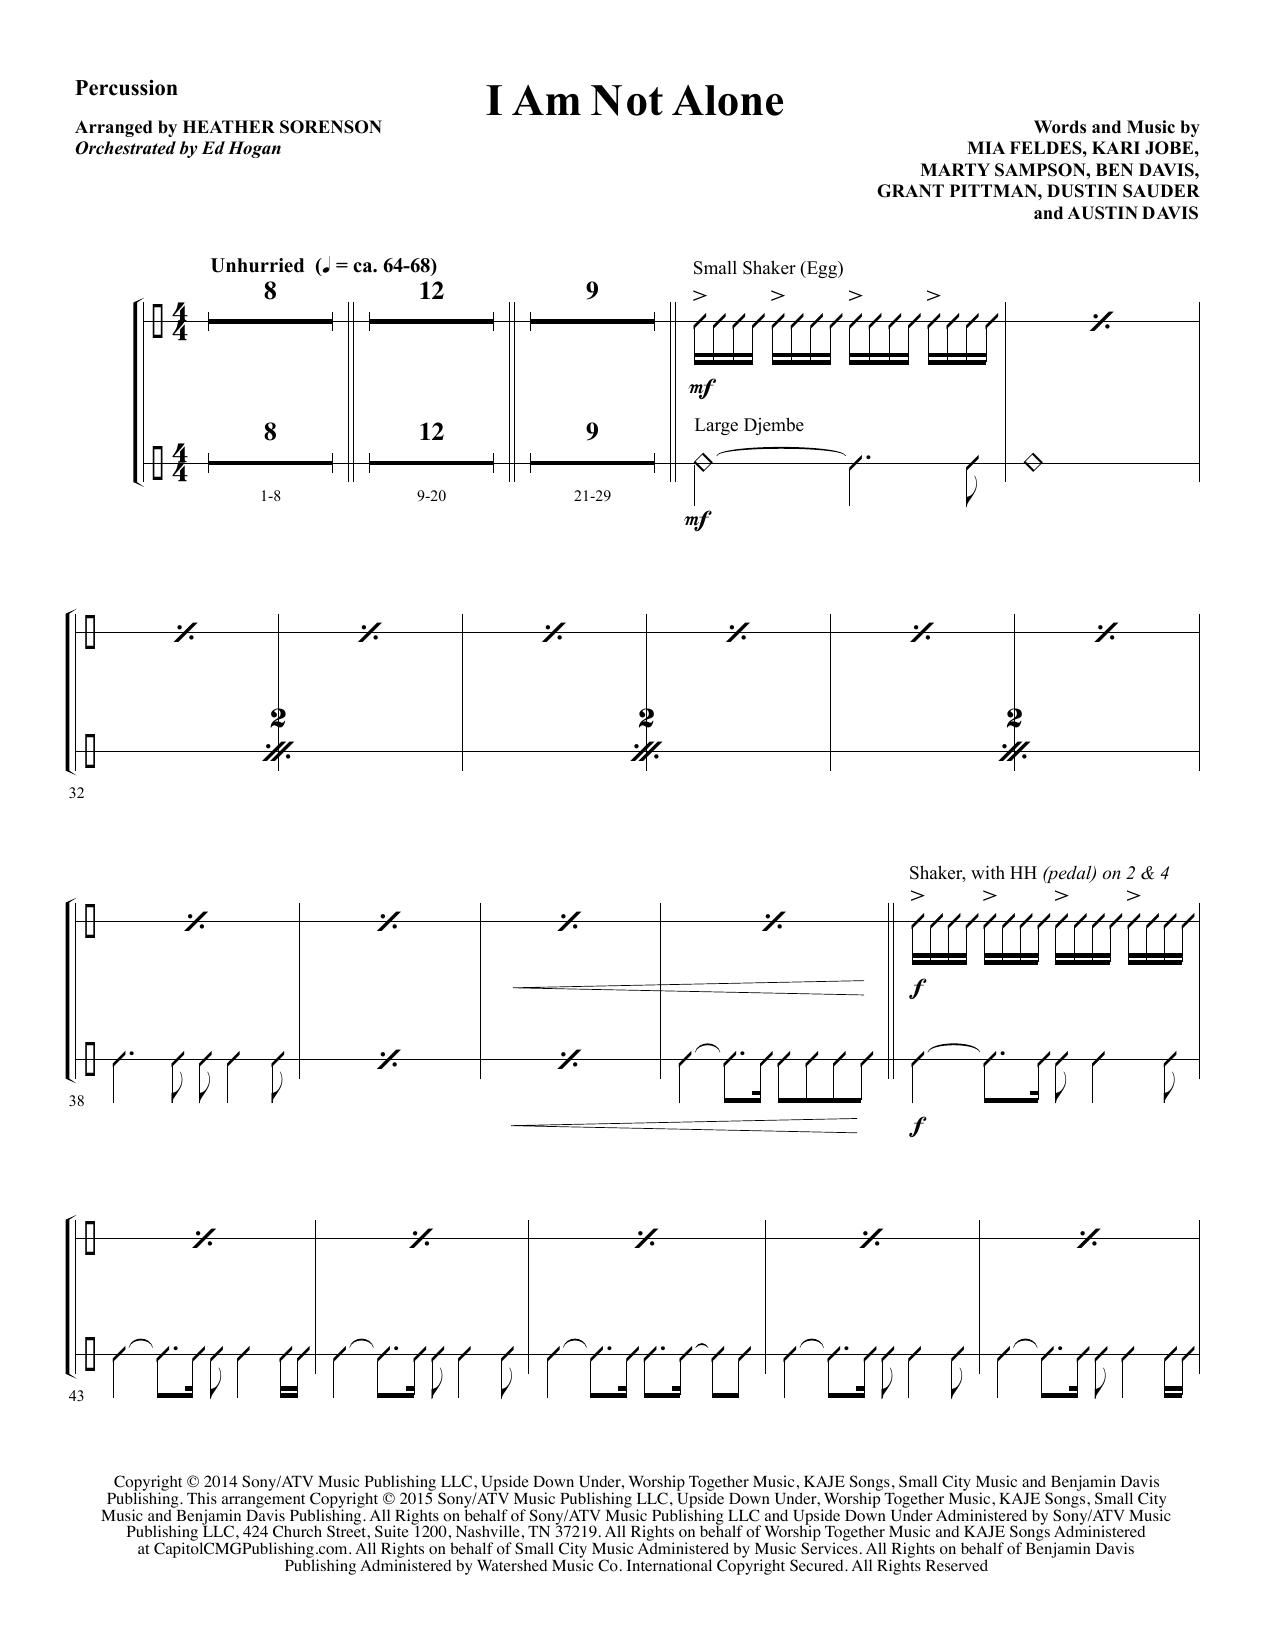 I Am Not Alone - Percussion sheet music